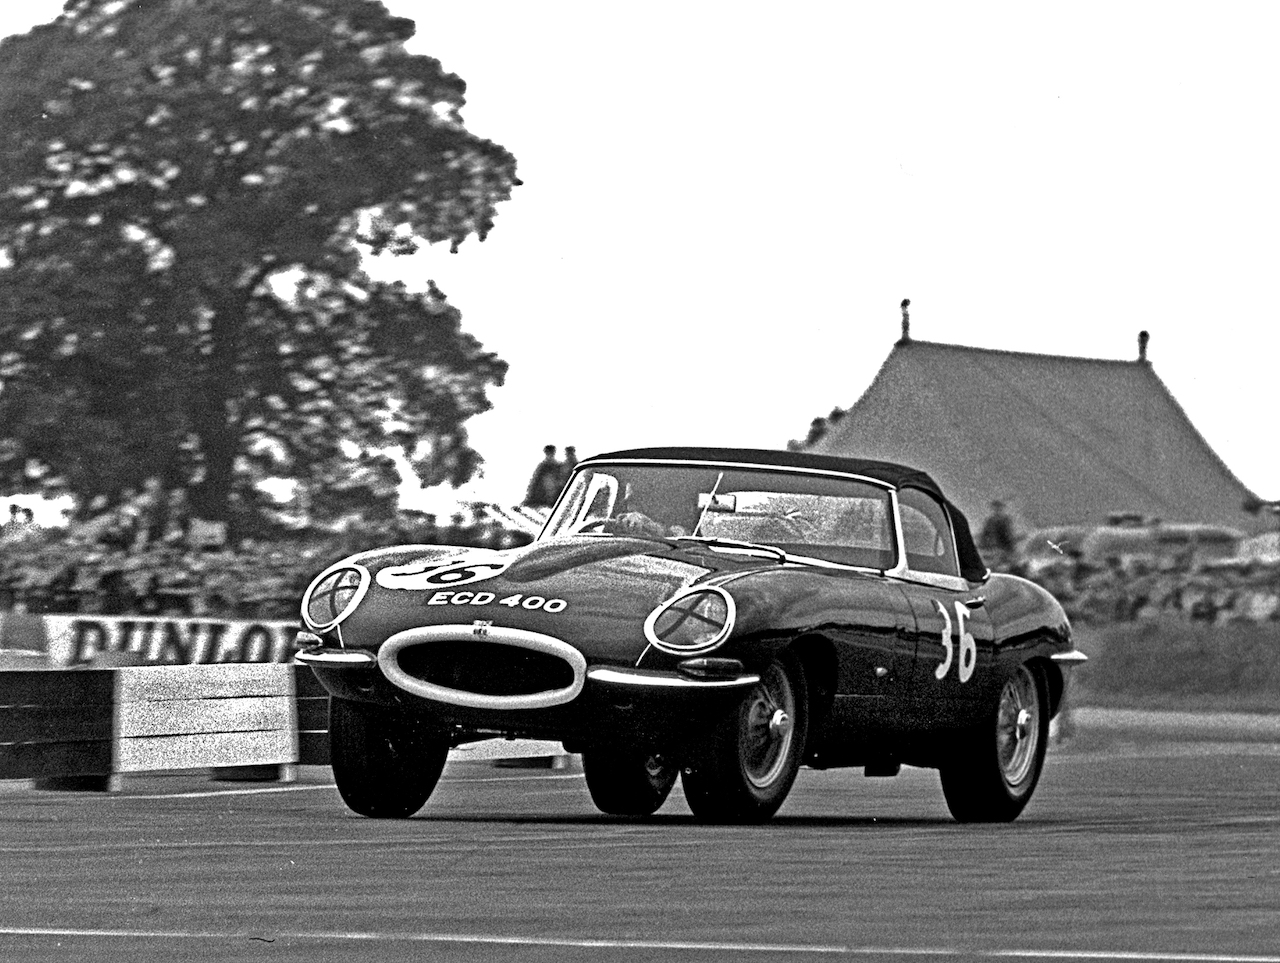 Damon Hill drives his Dad's debut winning 1961 Jaguar E-Type